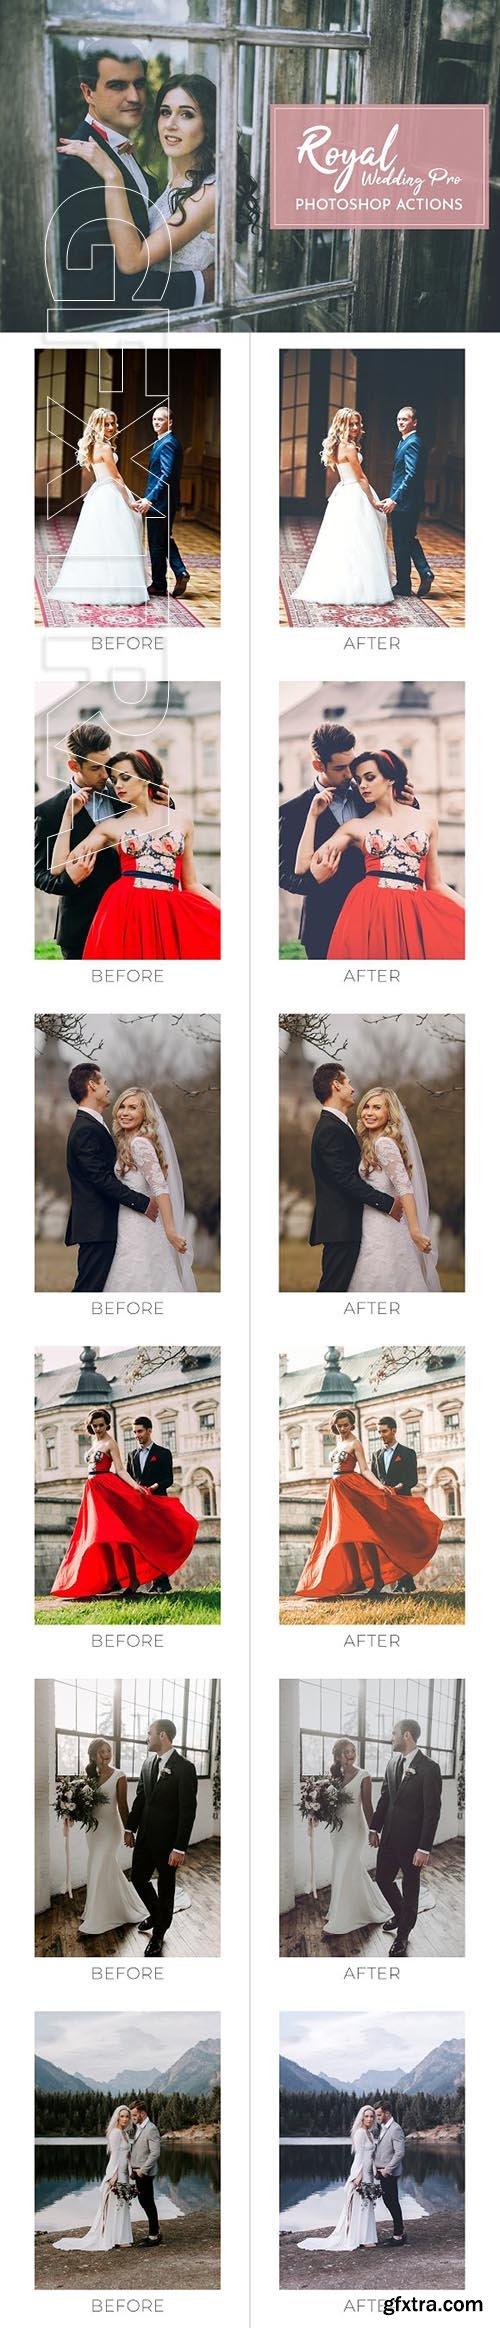 CreativeMarket - Royal Wedding Pro Photoshop Actions 2688845